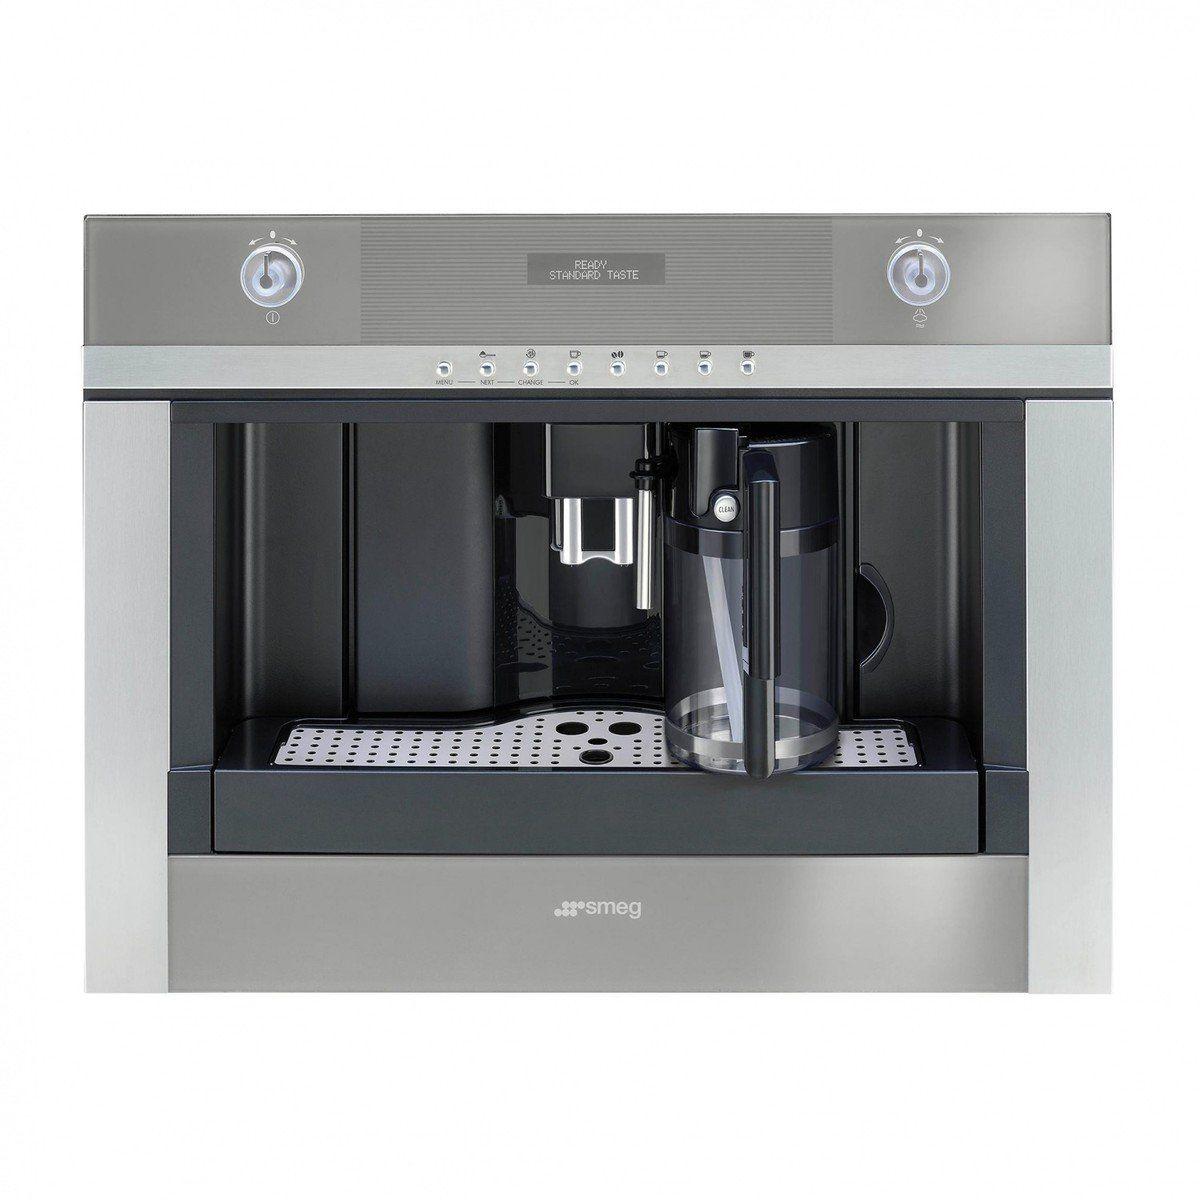 Einbau Kaffeevollautomat cmsc451 einbau kaffeevollautomat smeg ambientedirect com